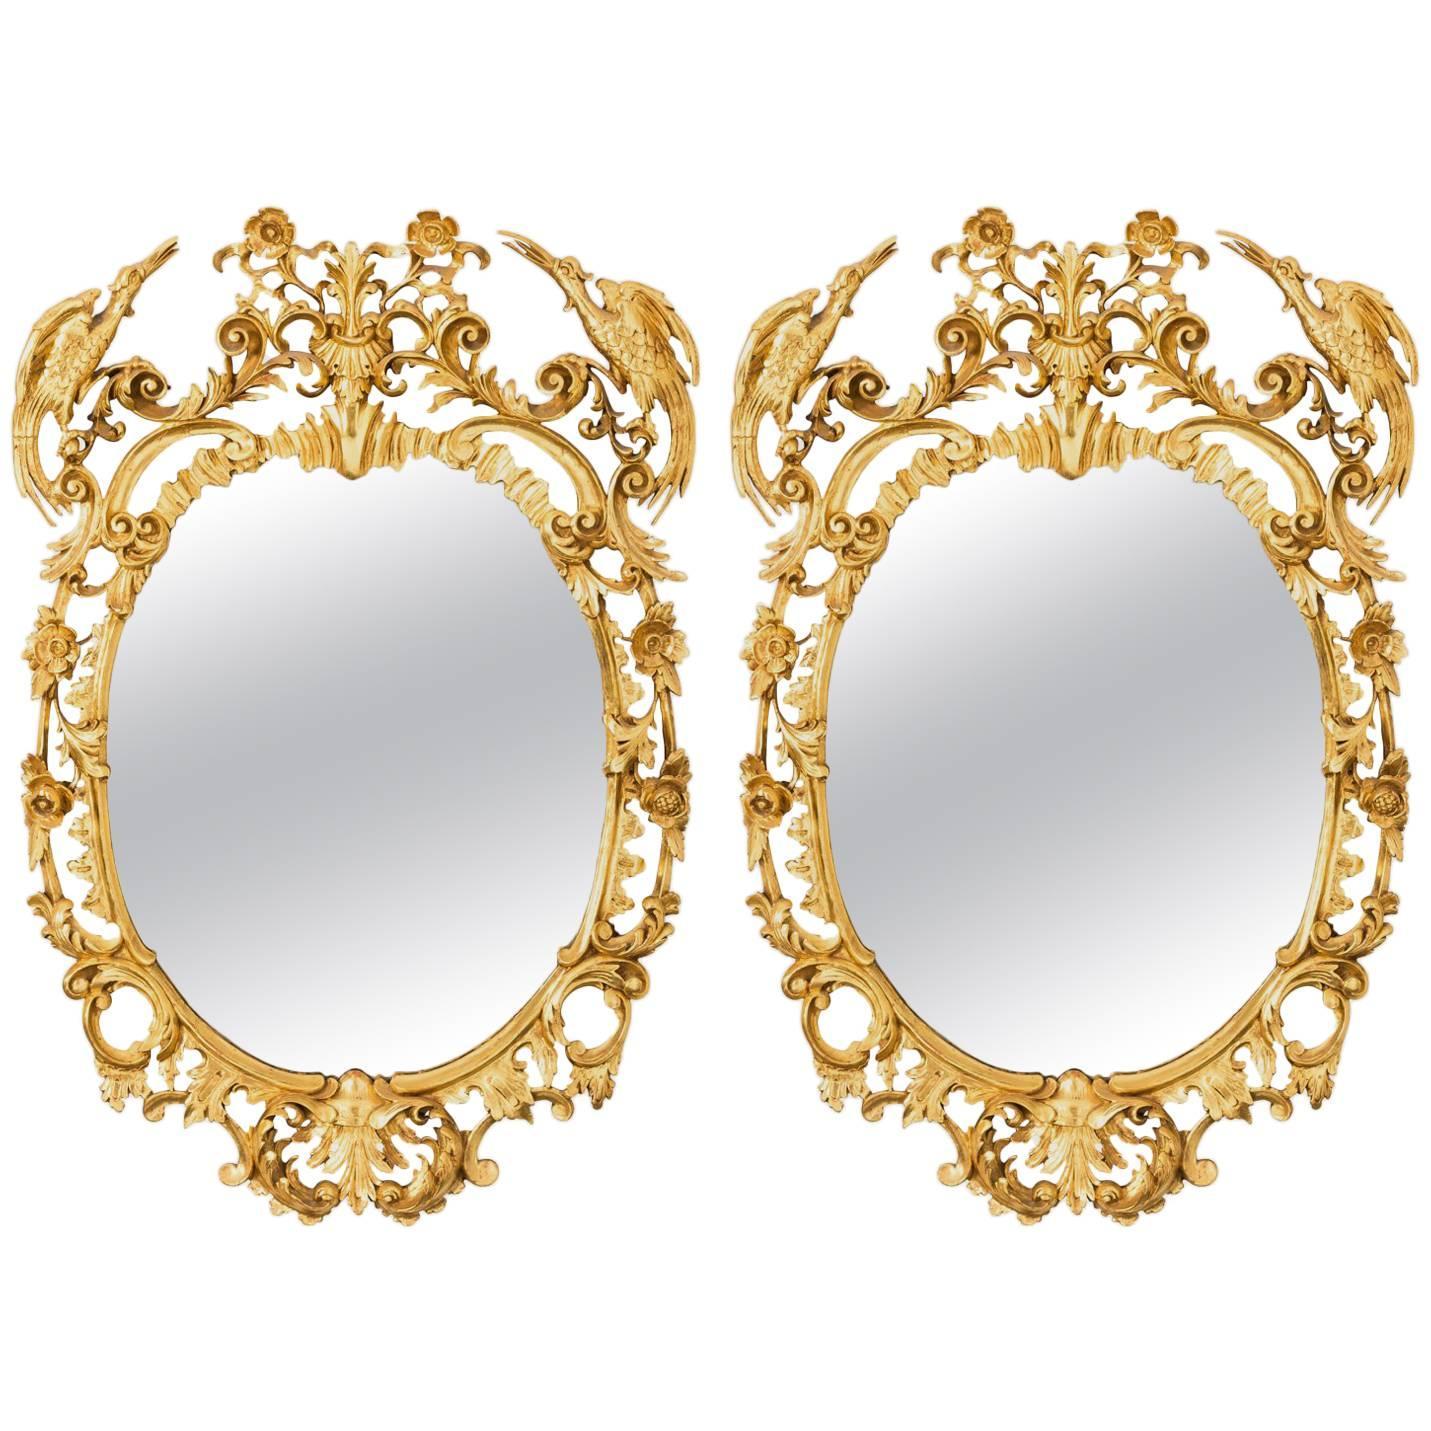 George III Style Oval Mirrors